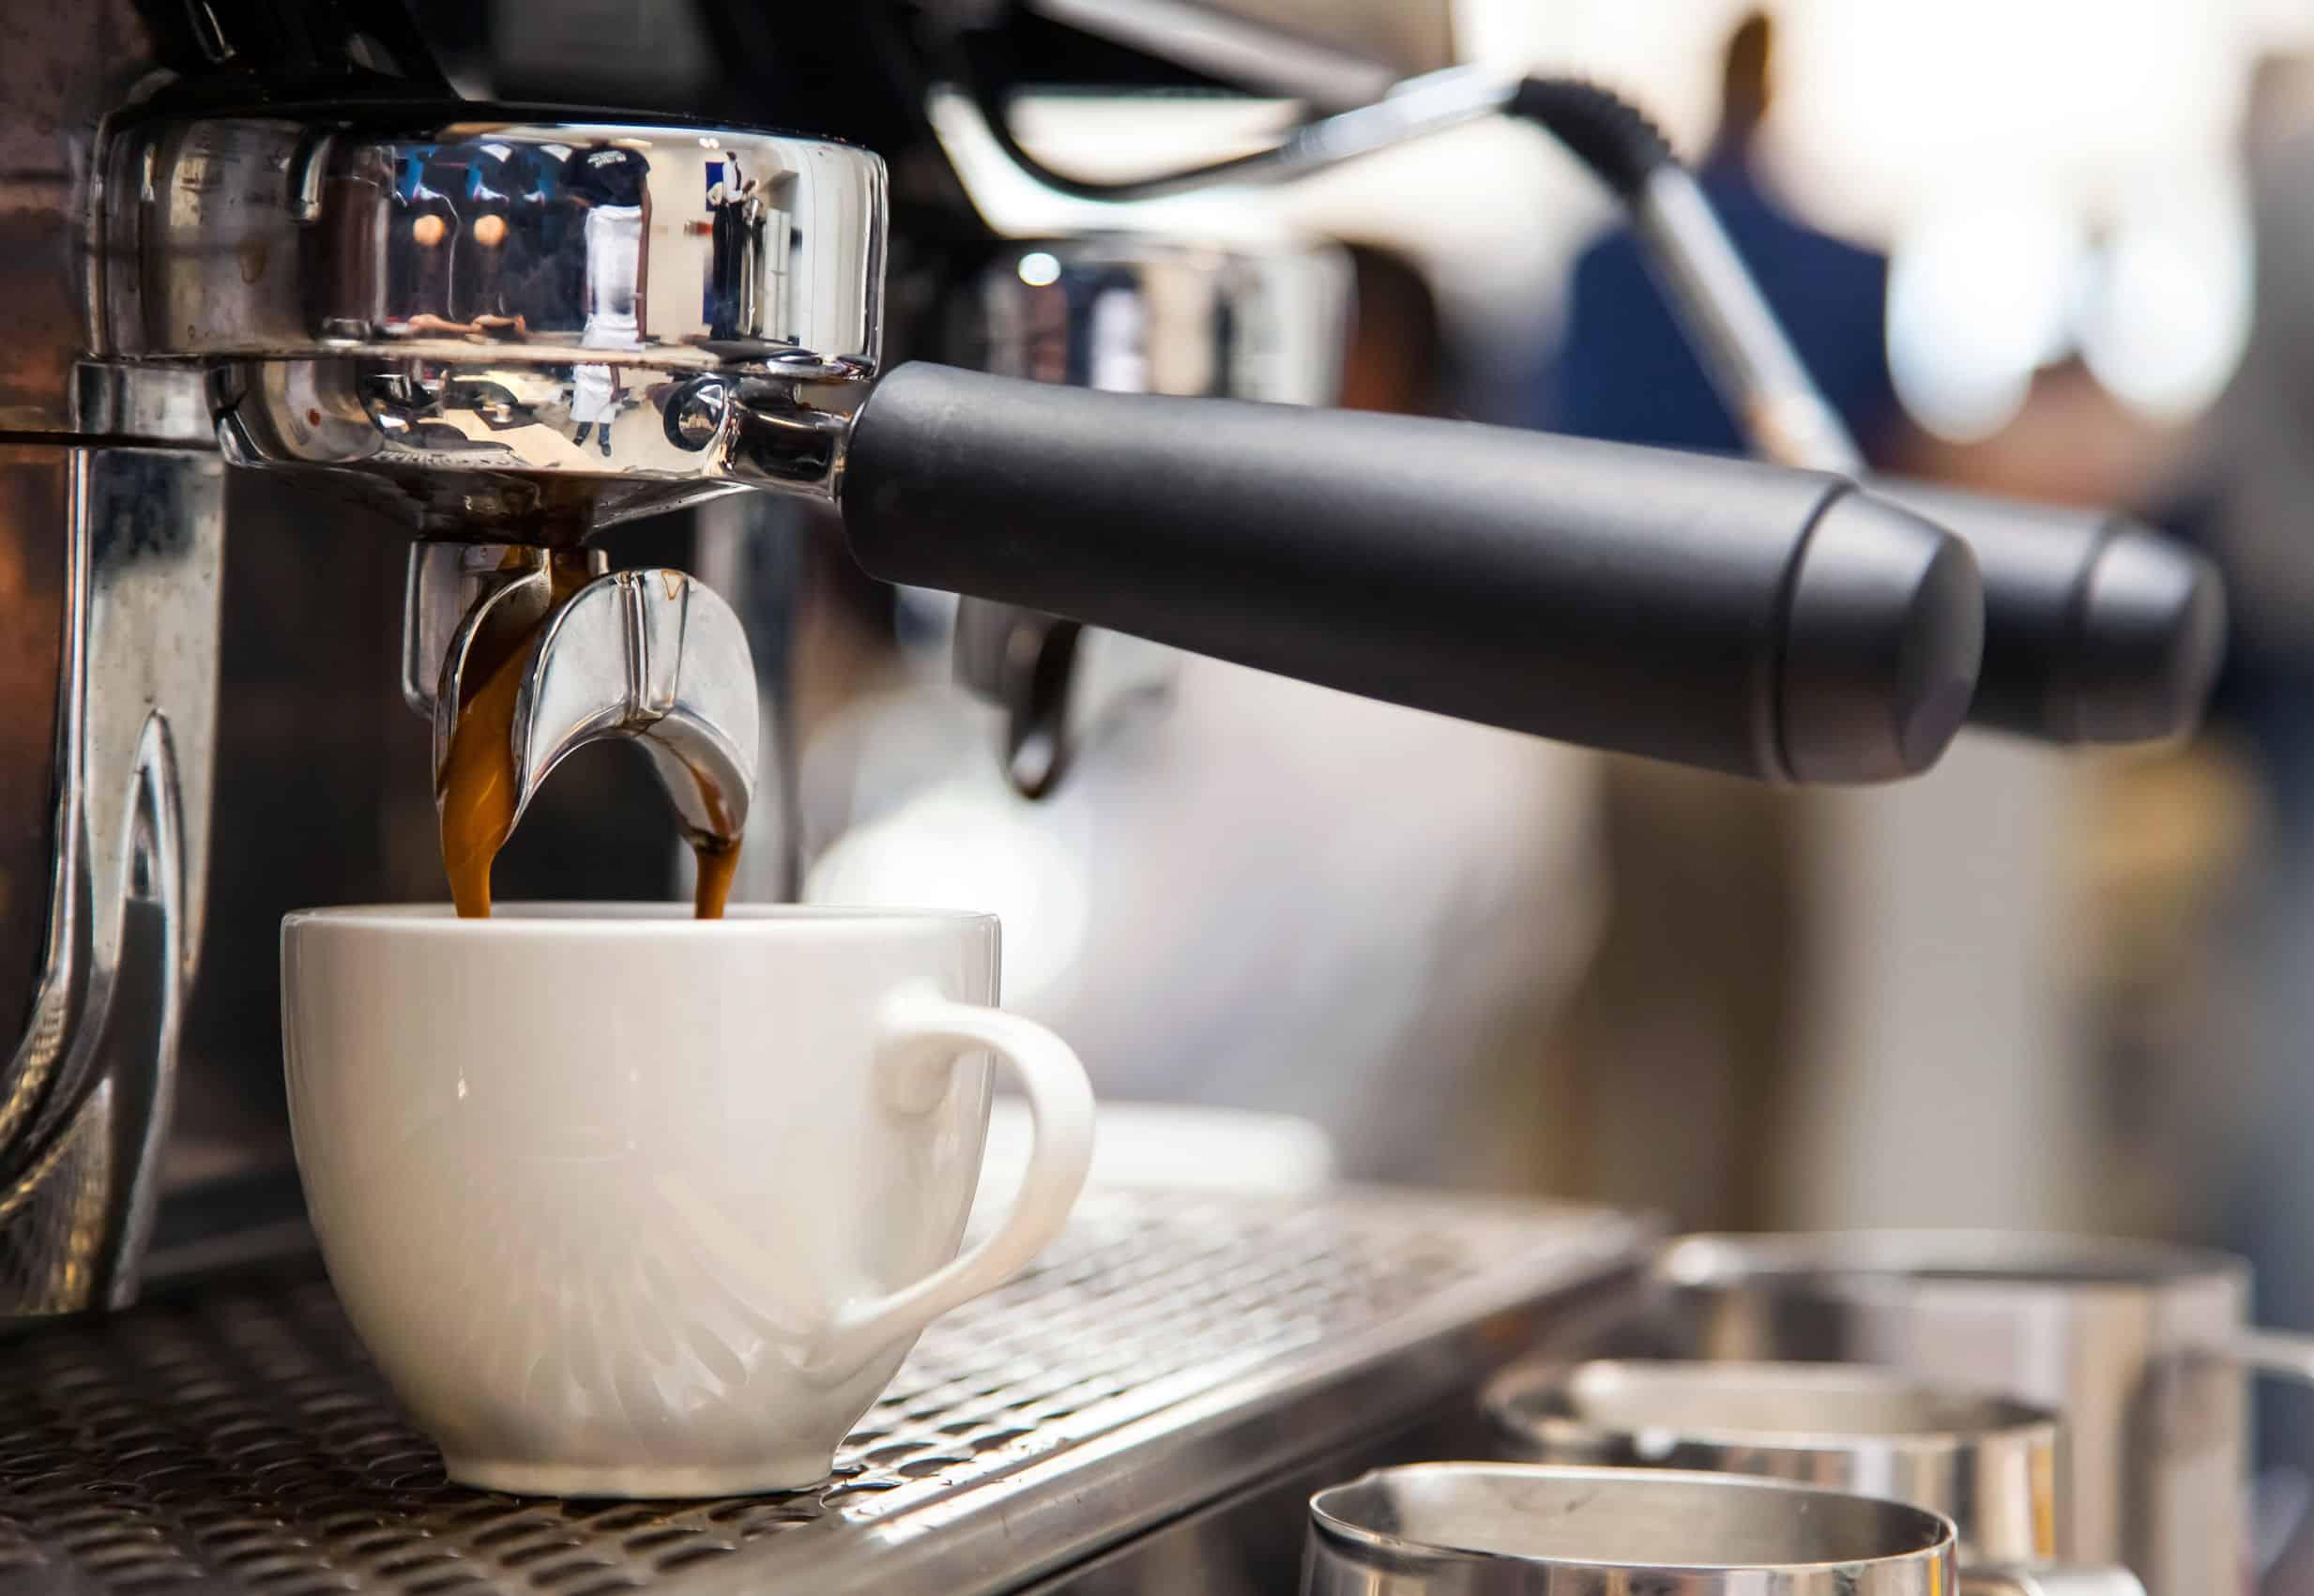 macchina-da-caffe-a-cialde-principale-xcyp1